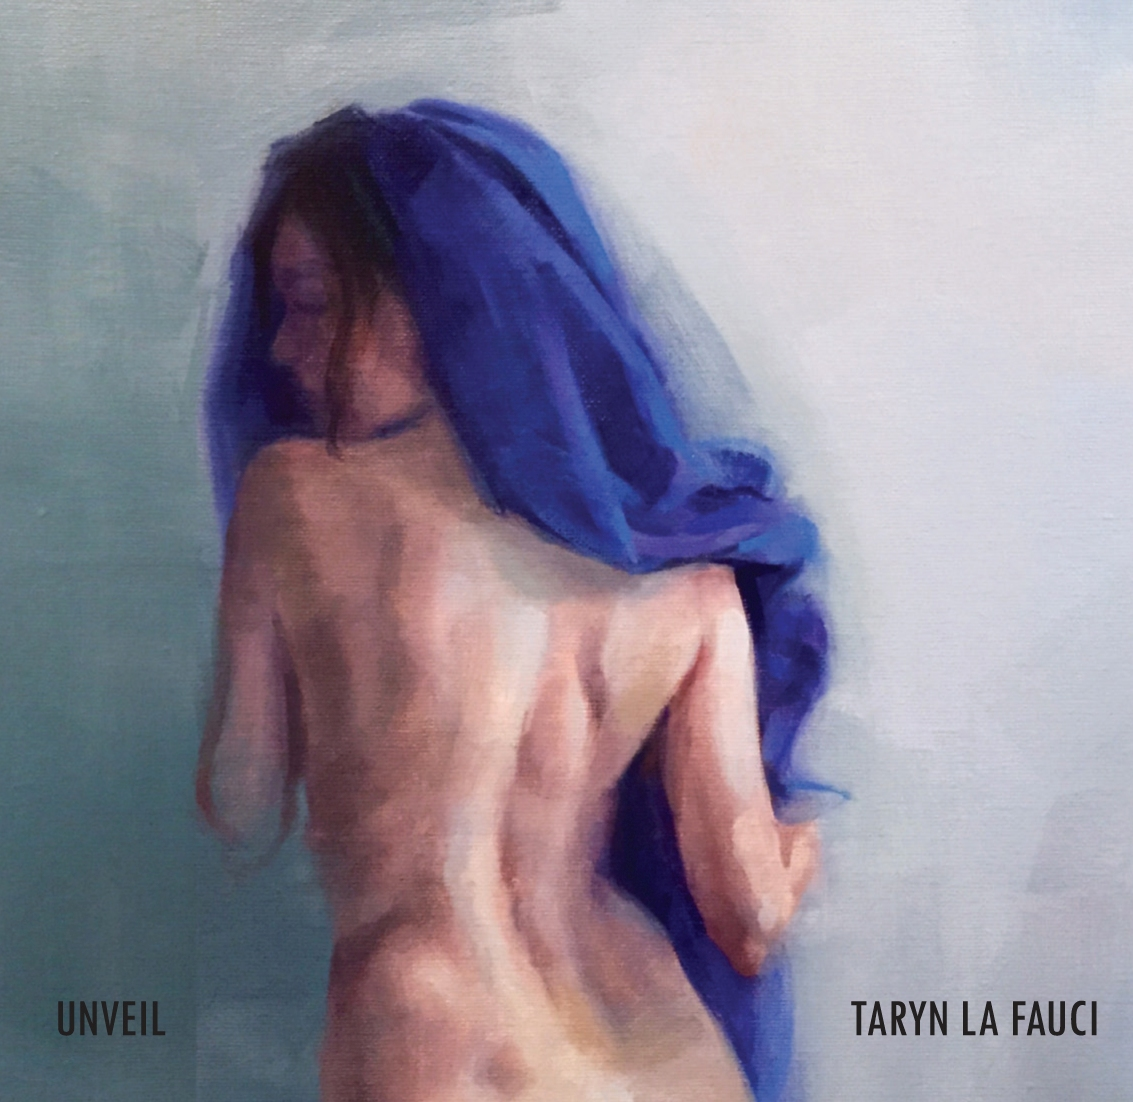 taryn_Unveil_final_cover.jpg